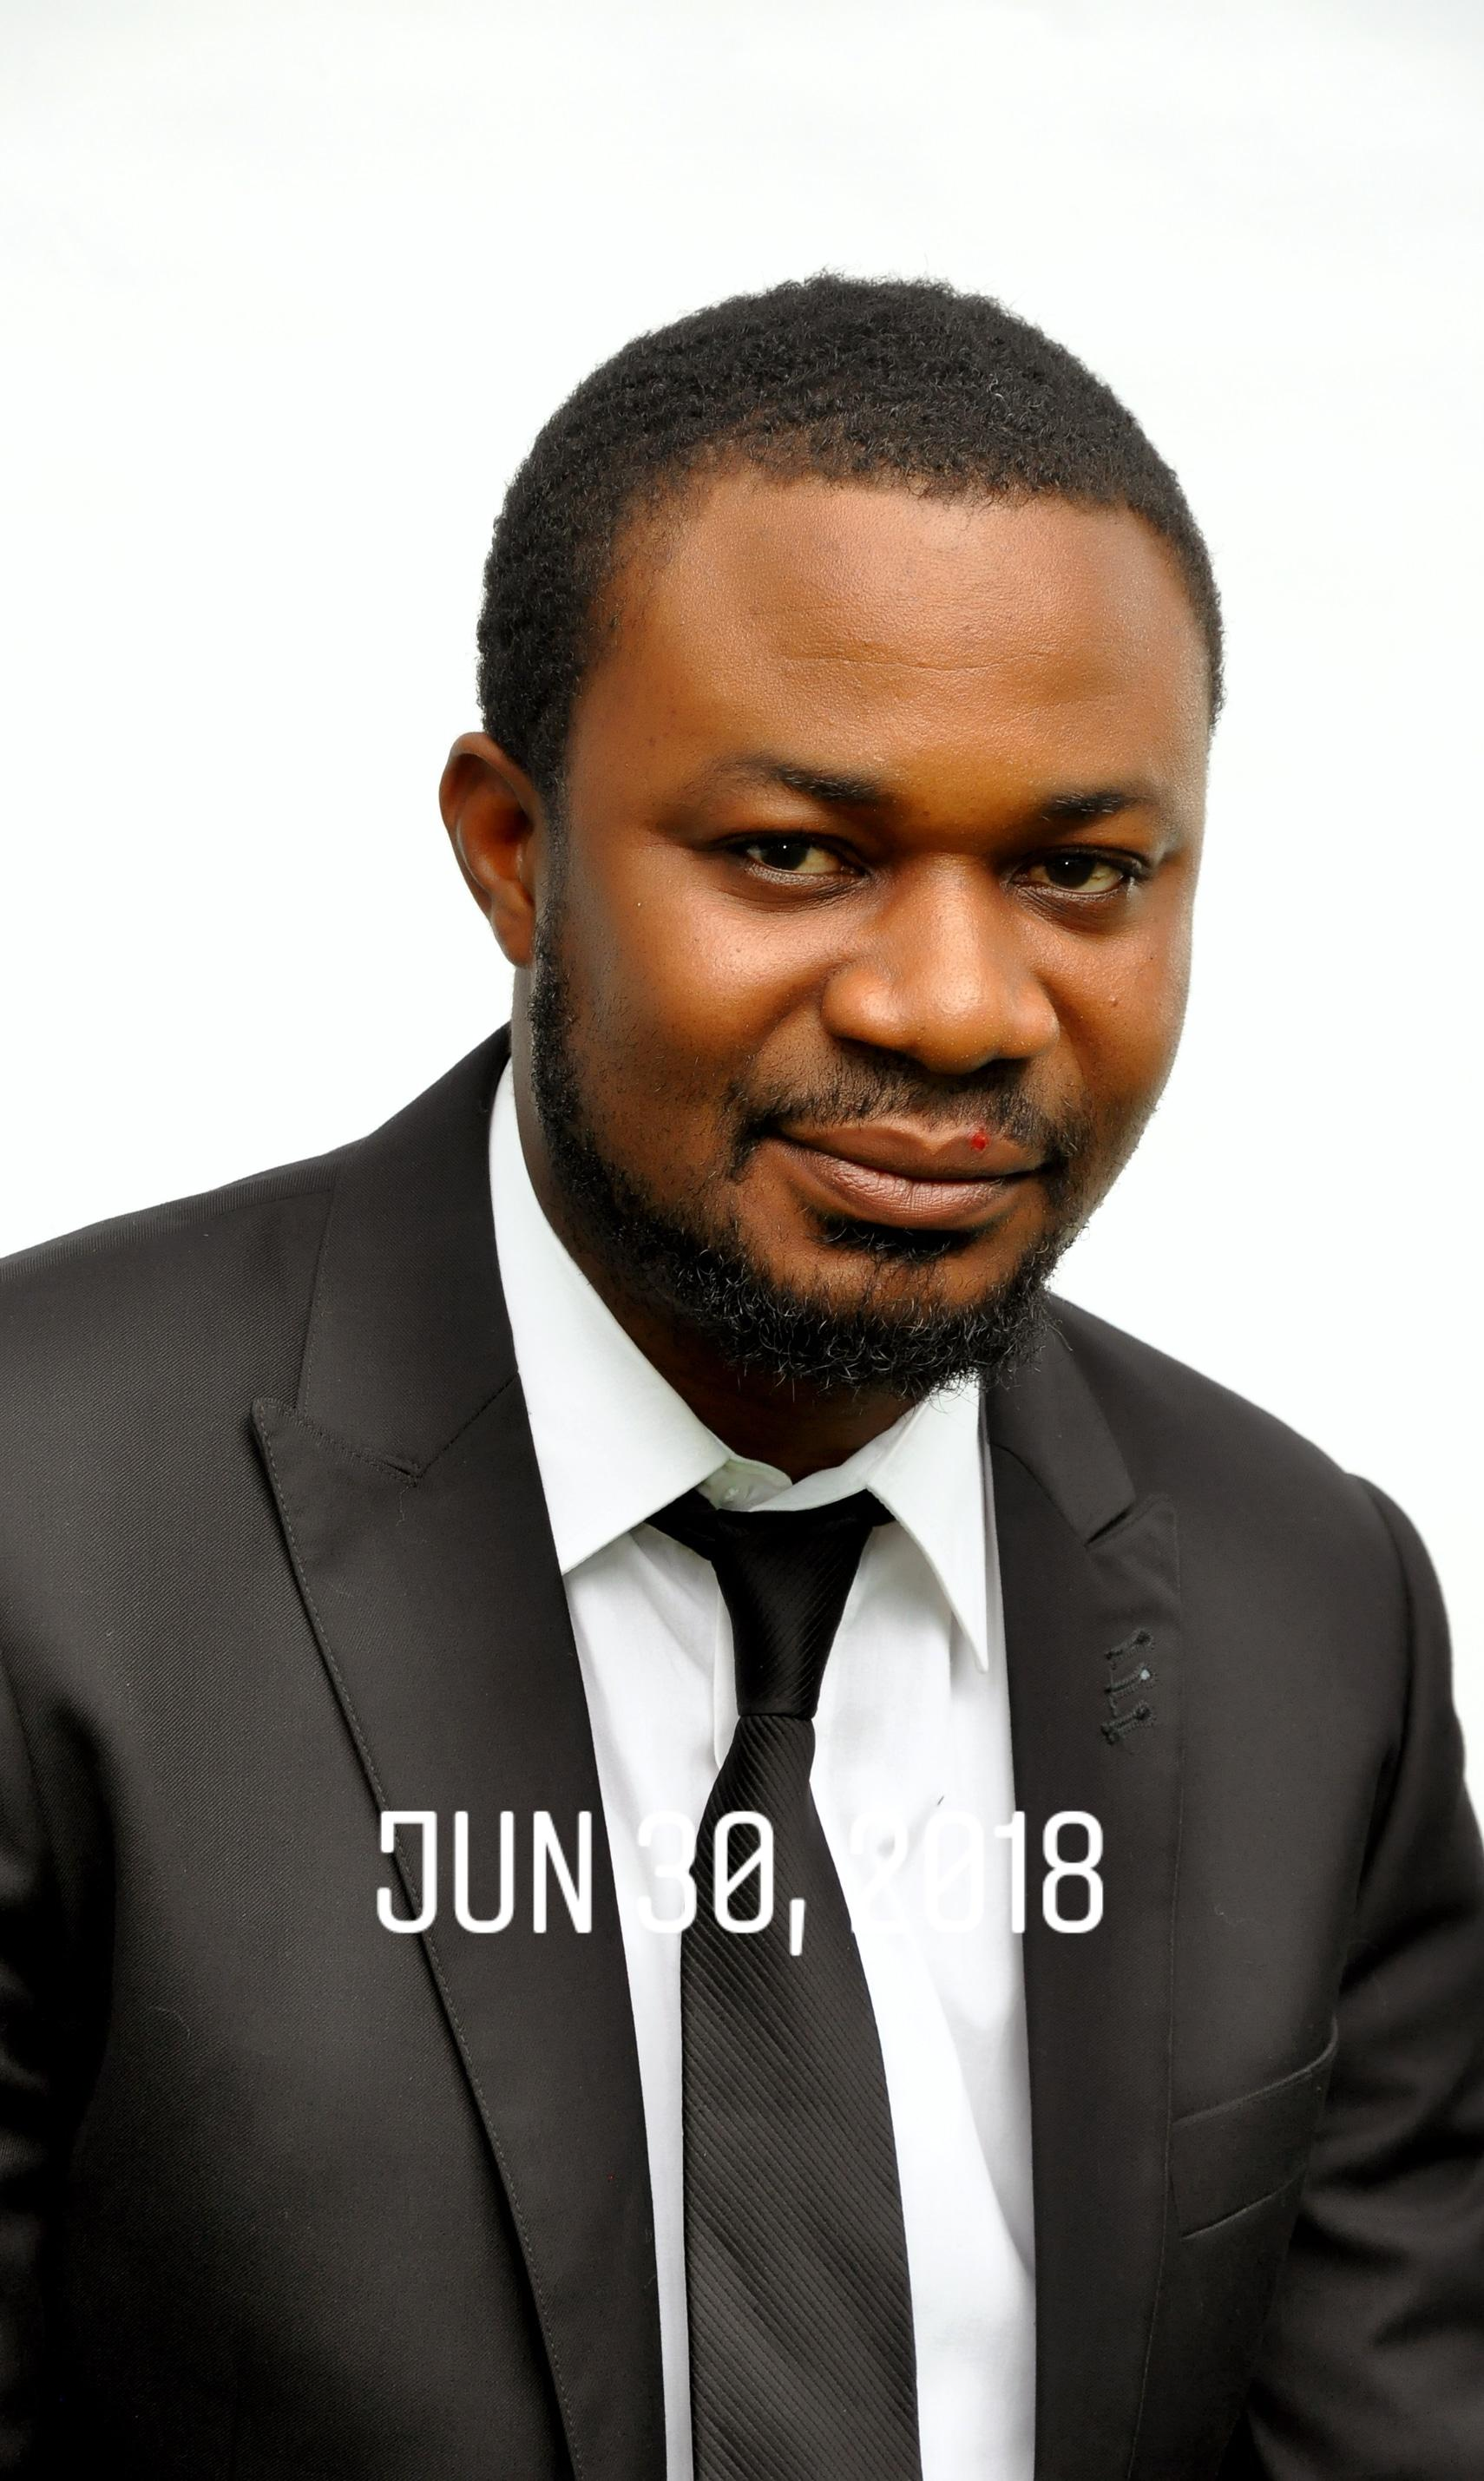 Ti-ouwani Emmanuel